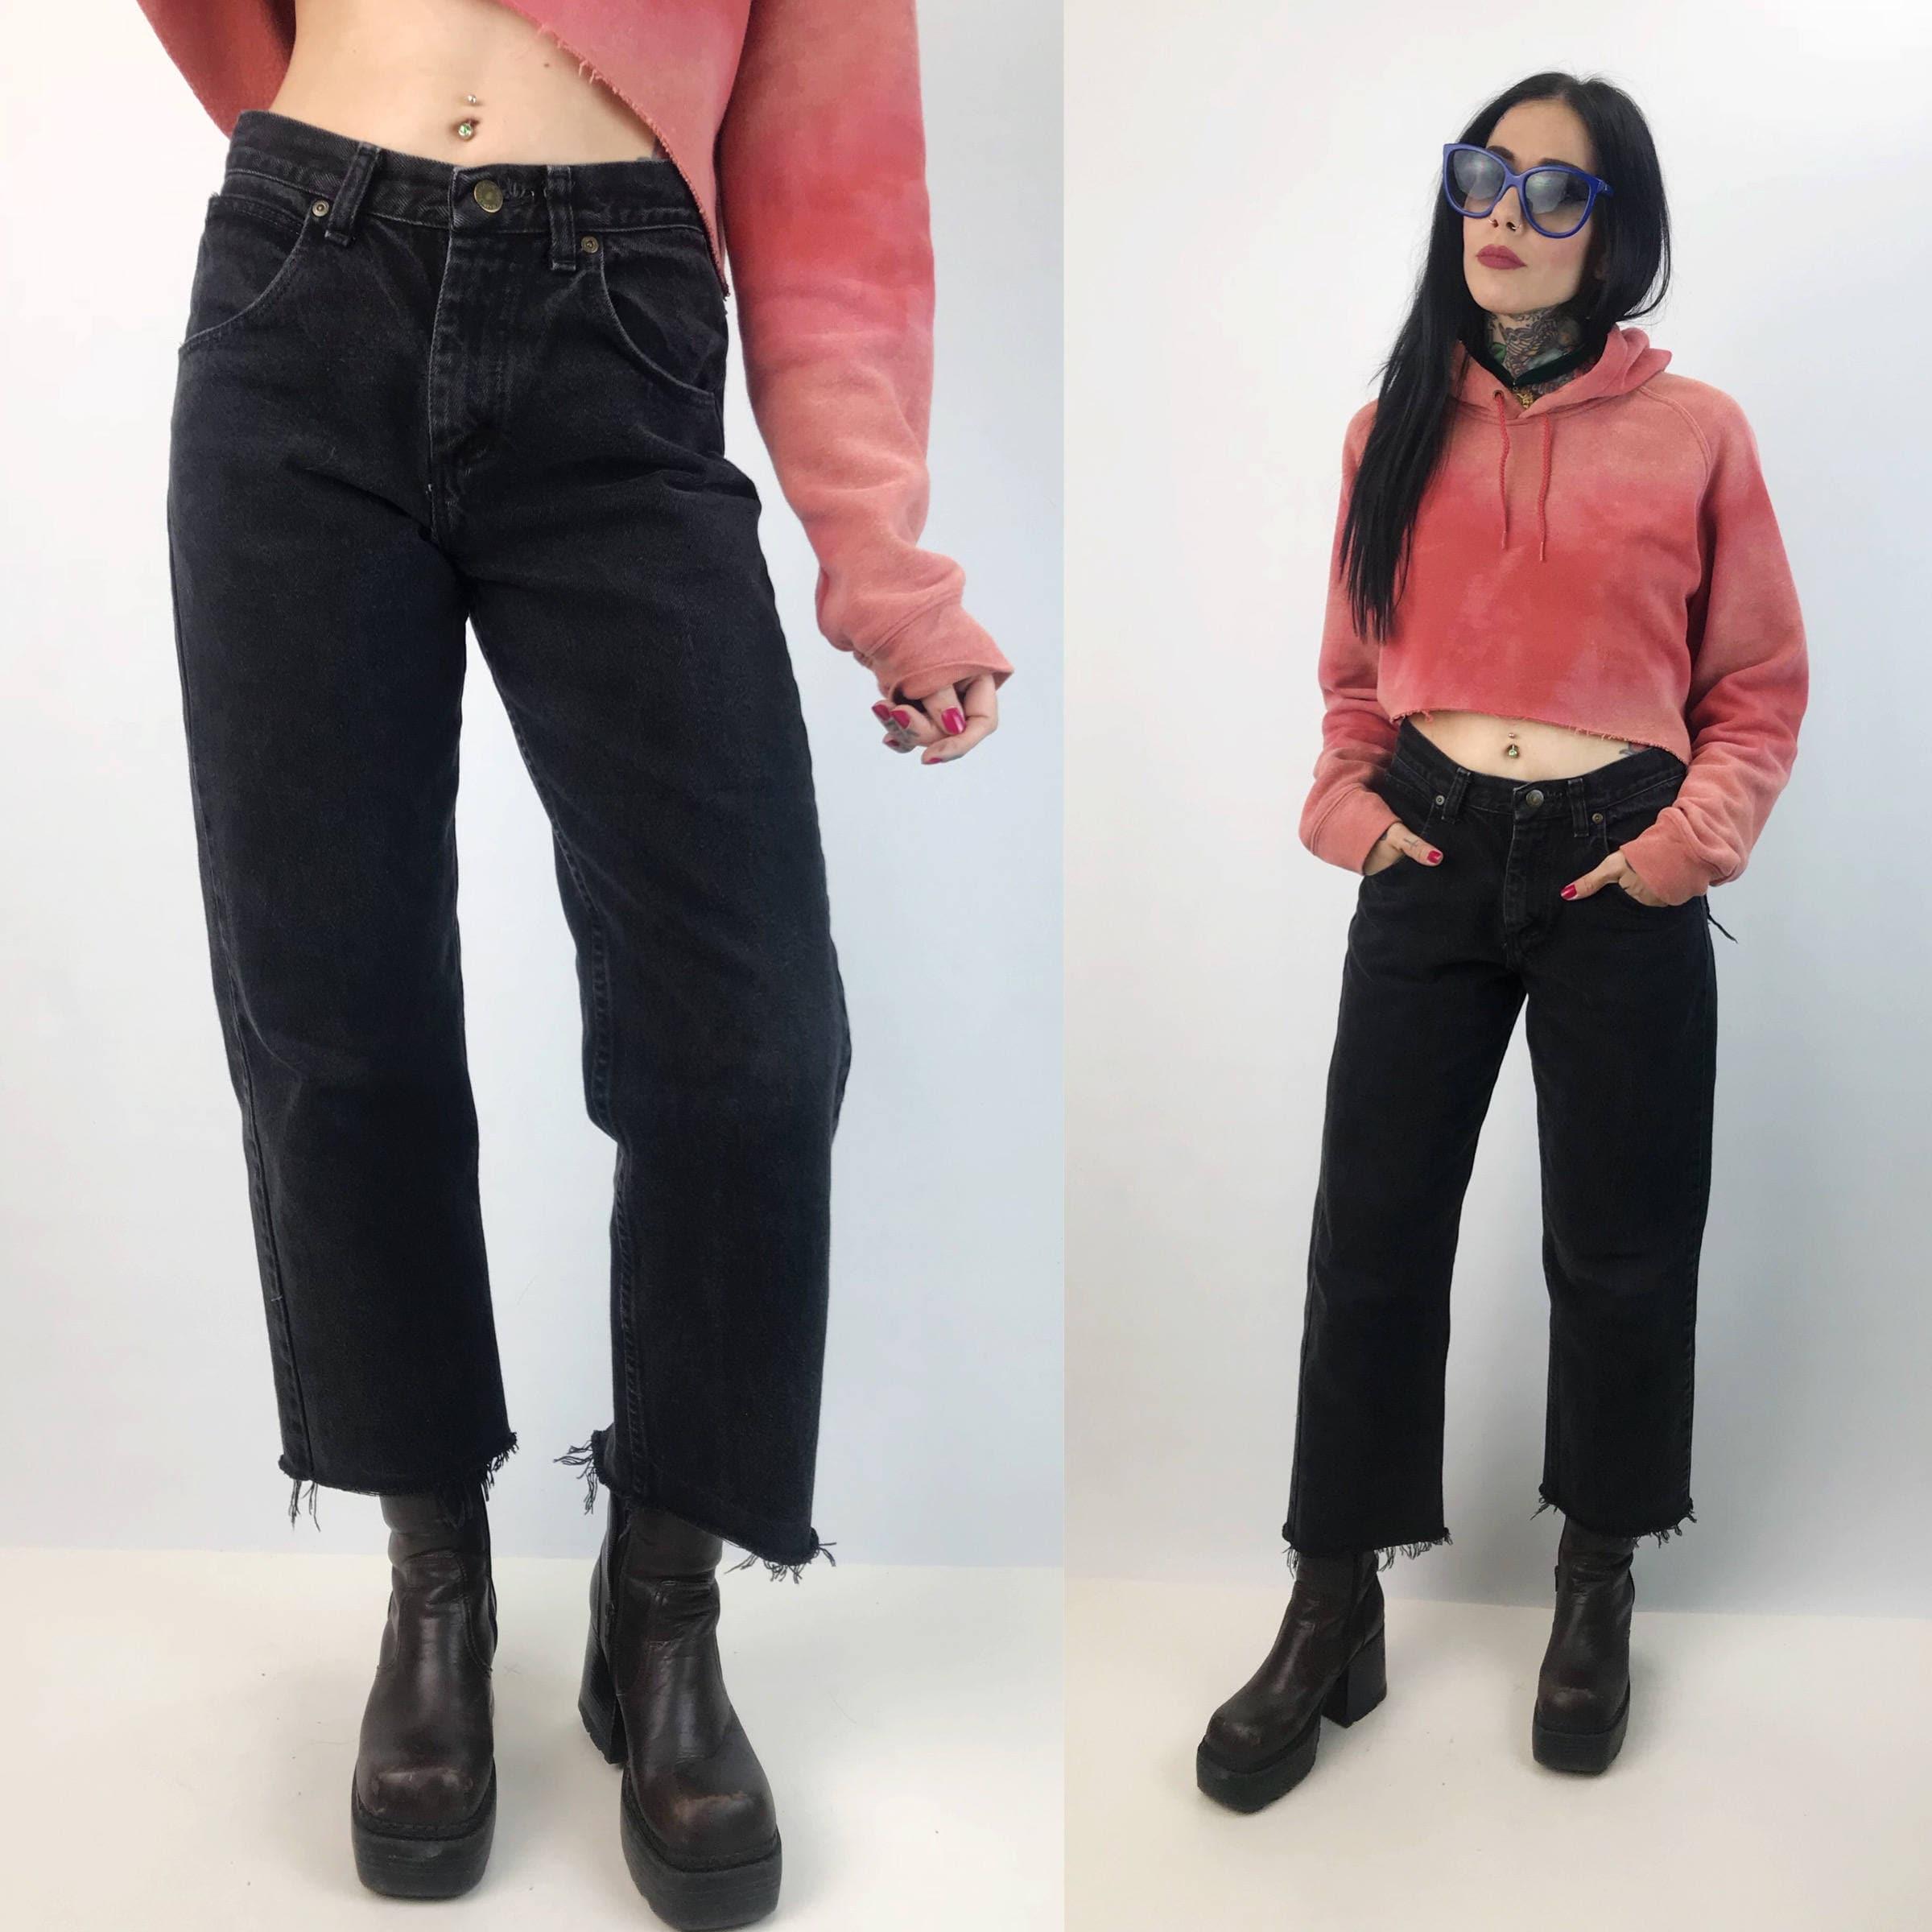 a8315c4d Wrangler Wide Leg Frayed Jeans Size 14 Boys / Women small 28